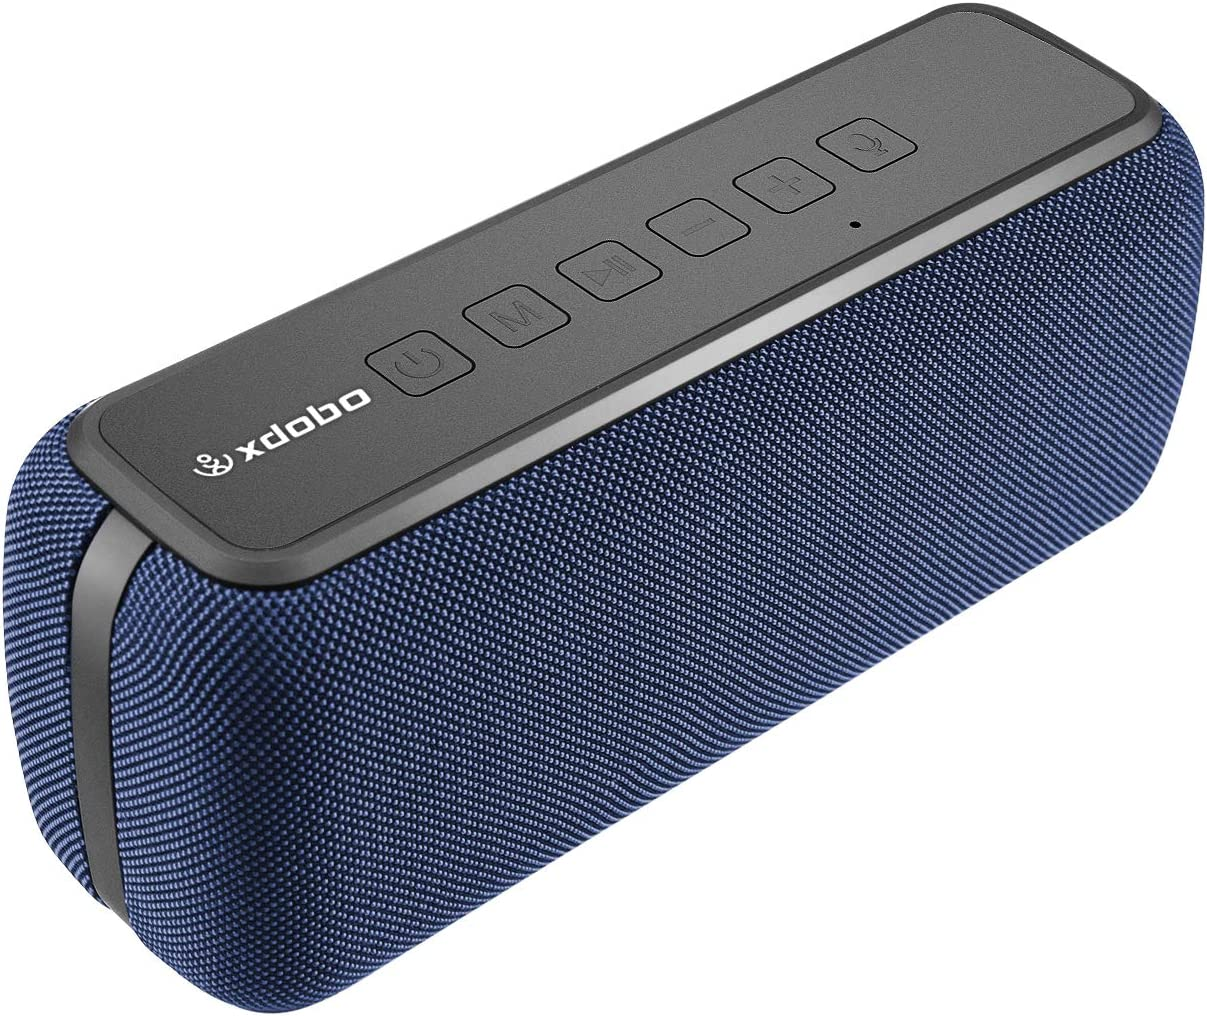 XDOBO Bluetooth Speaker – 60 Watt Powered V5.0 Rich Bass